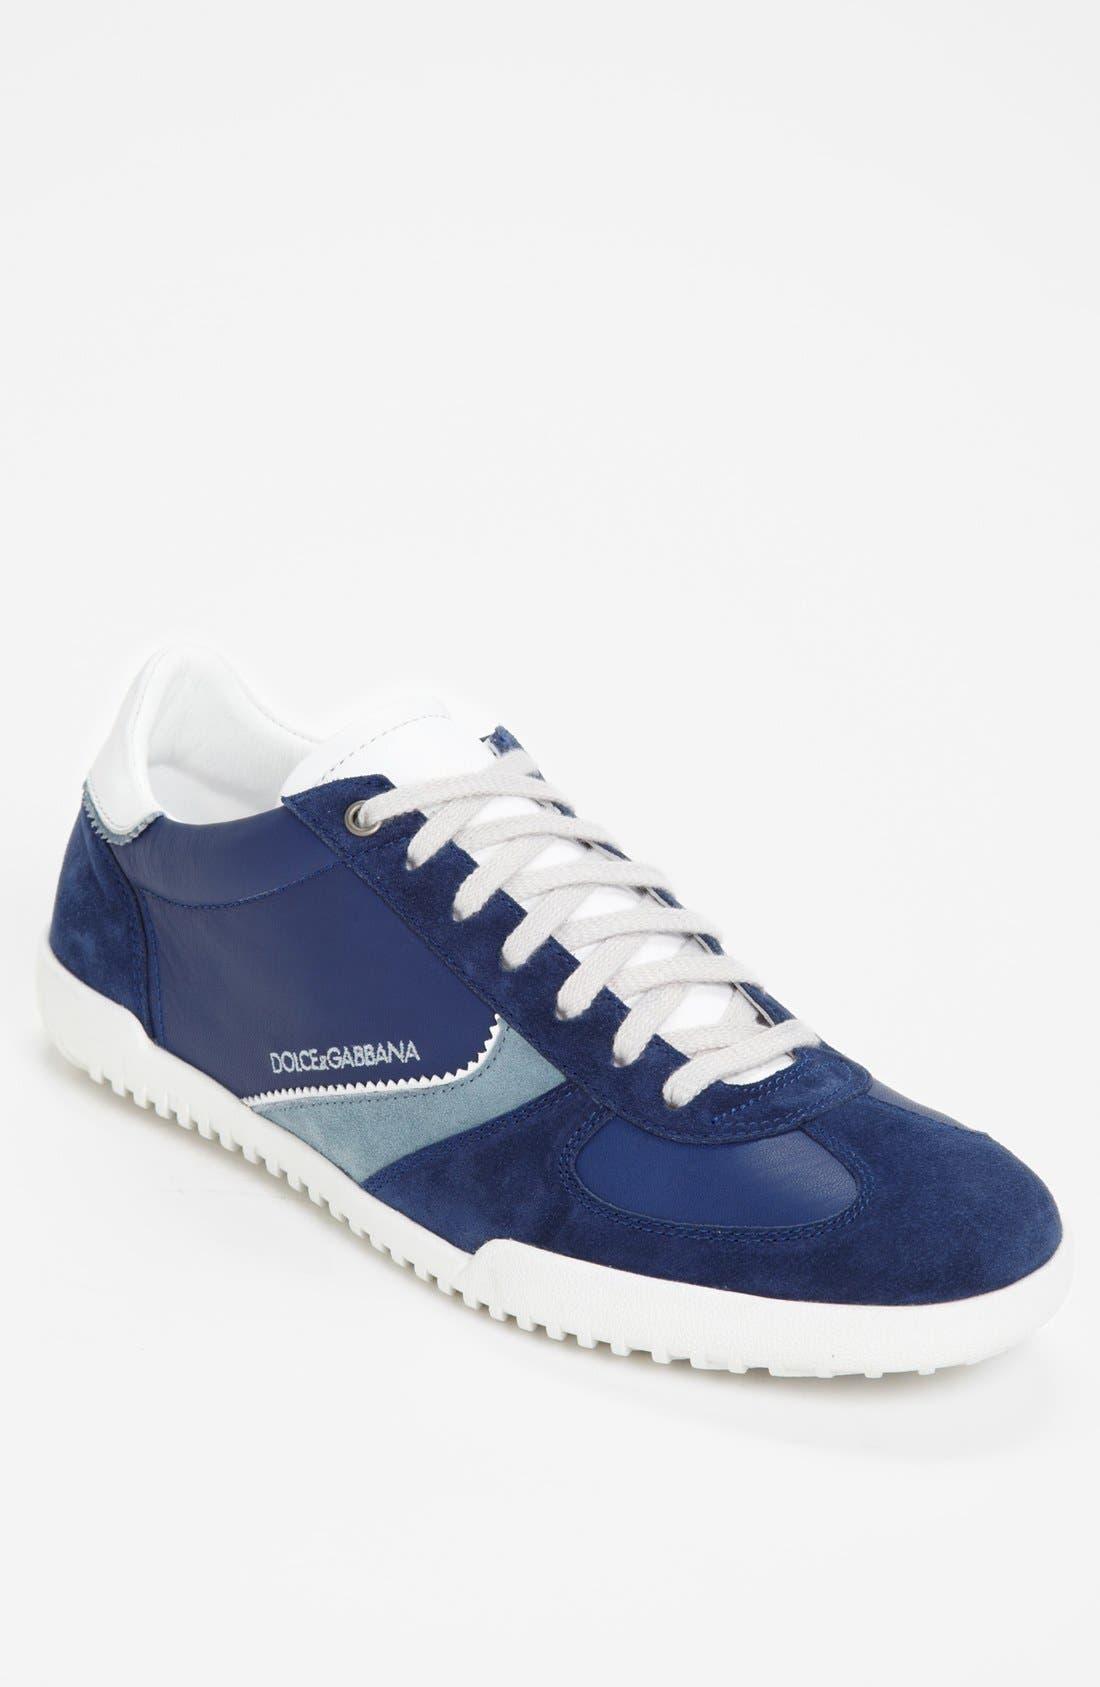 Main Image - Dolce&Gabbana 'Parcours' Sneaker